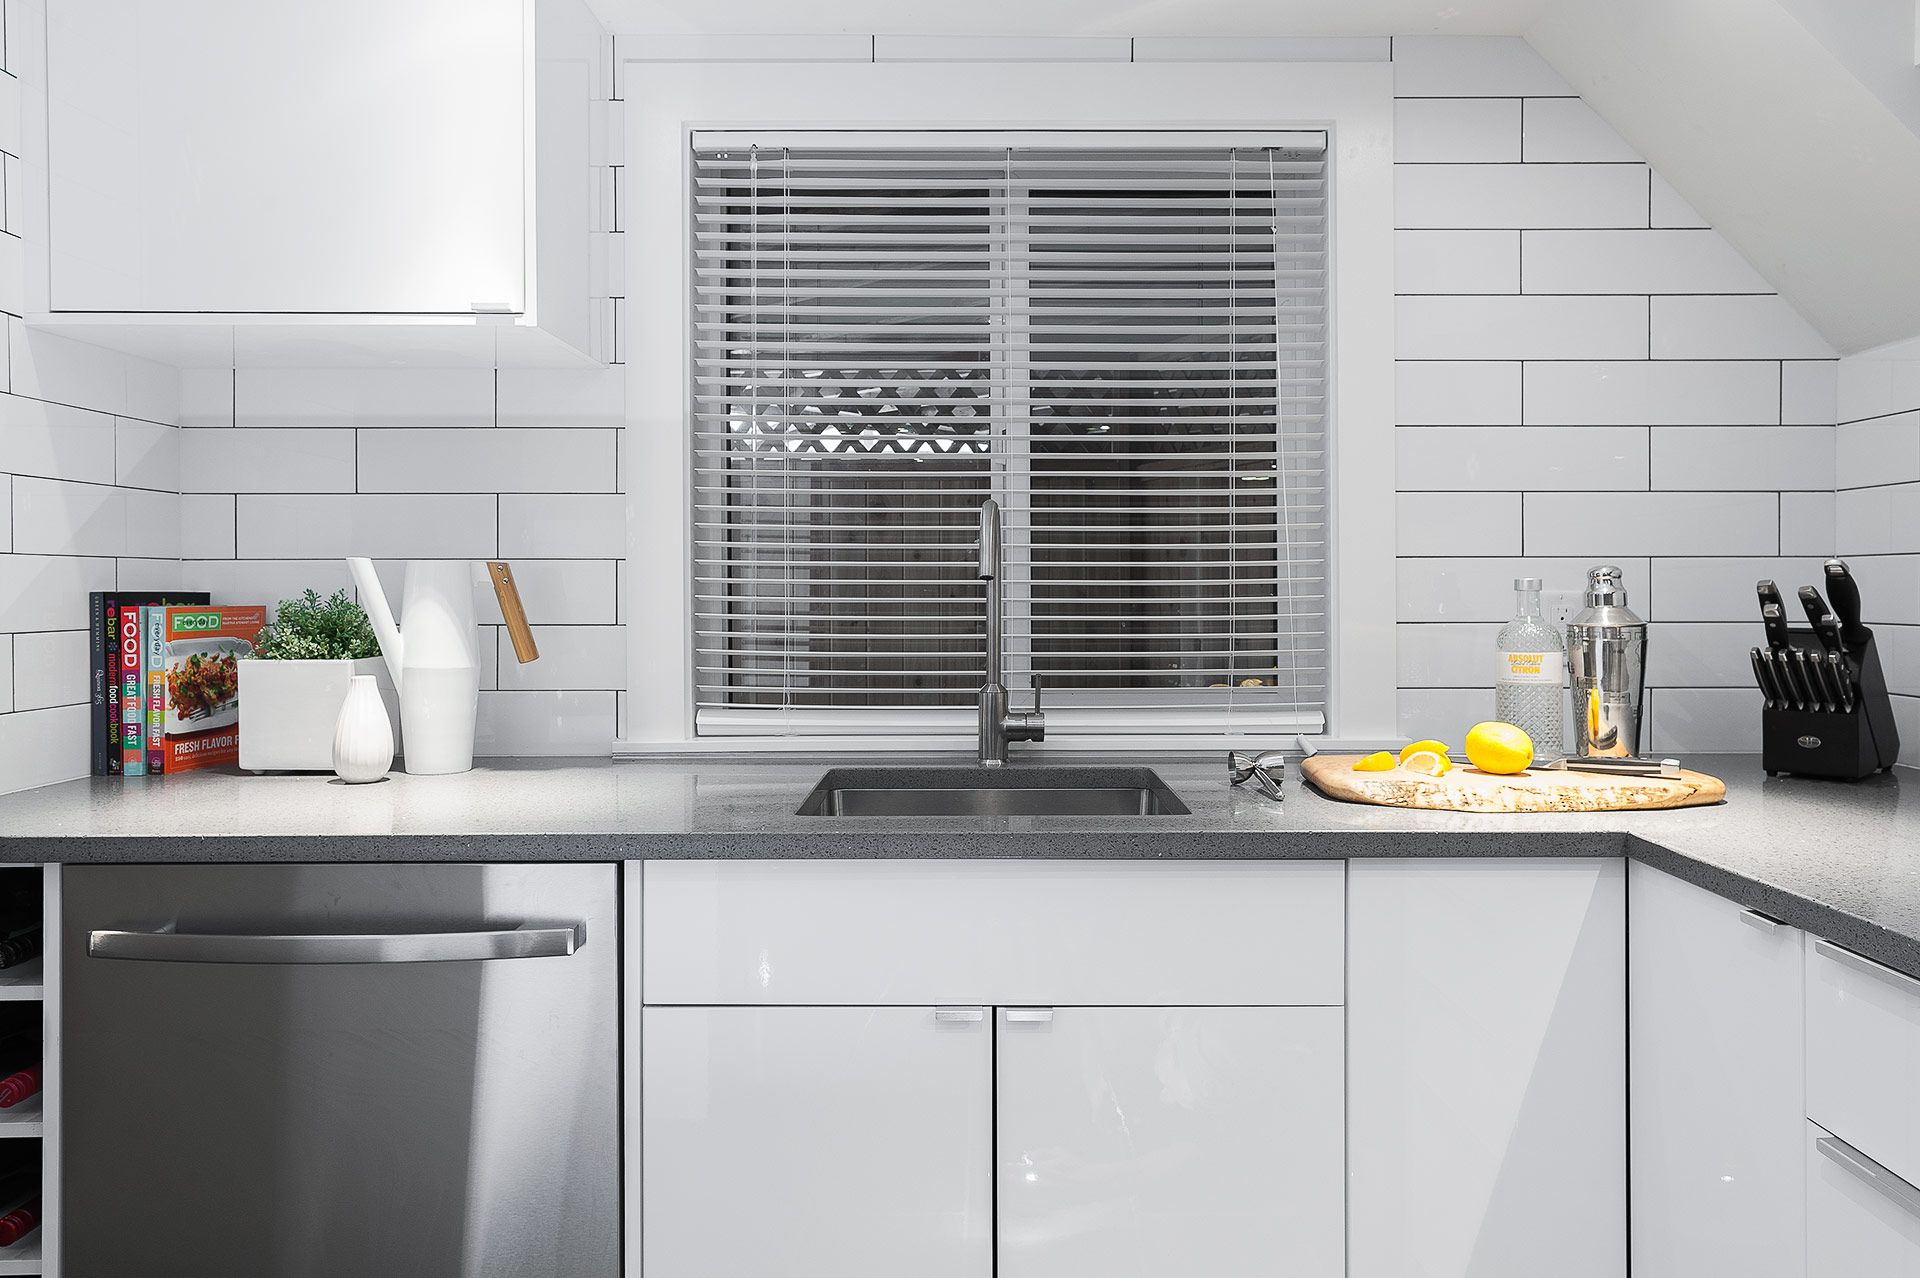 Awesome Bit Kitchen Mold - Kitchen Cabinets | Ideas & Inspiration ...